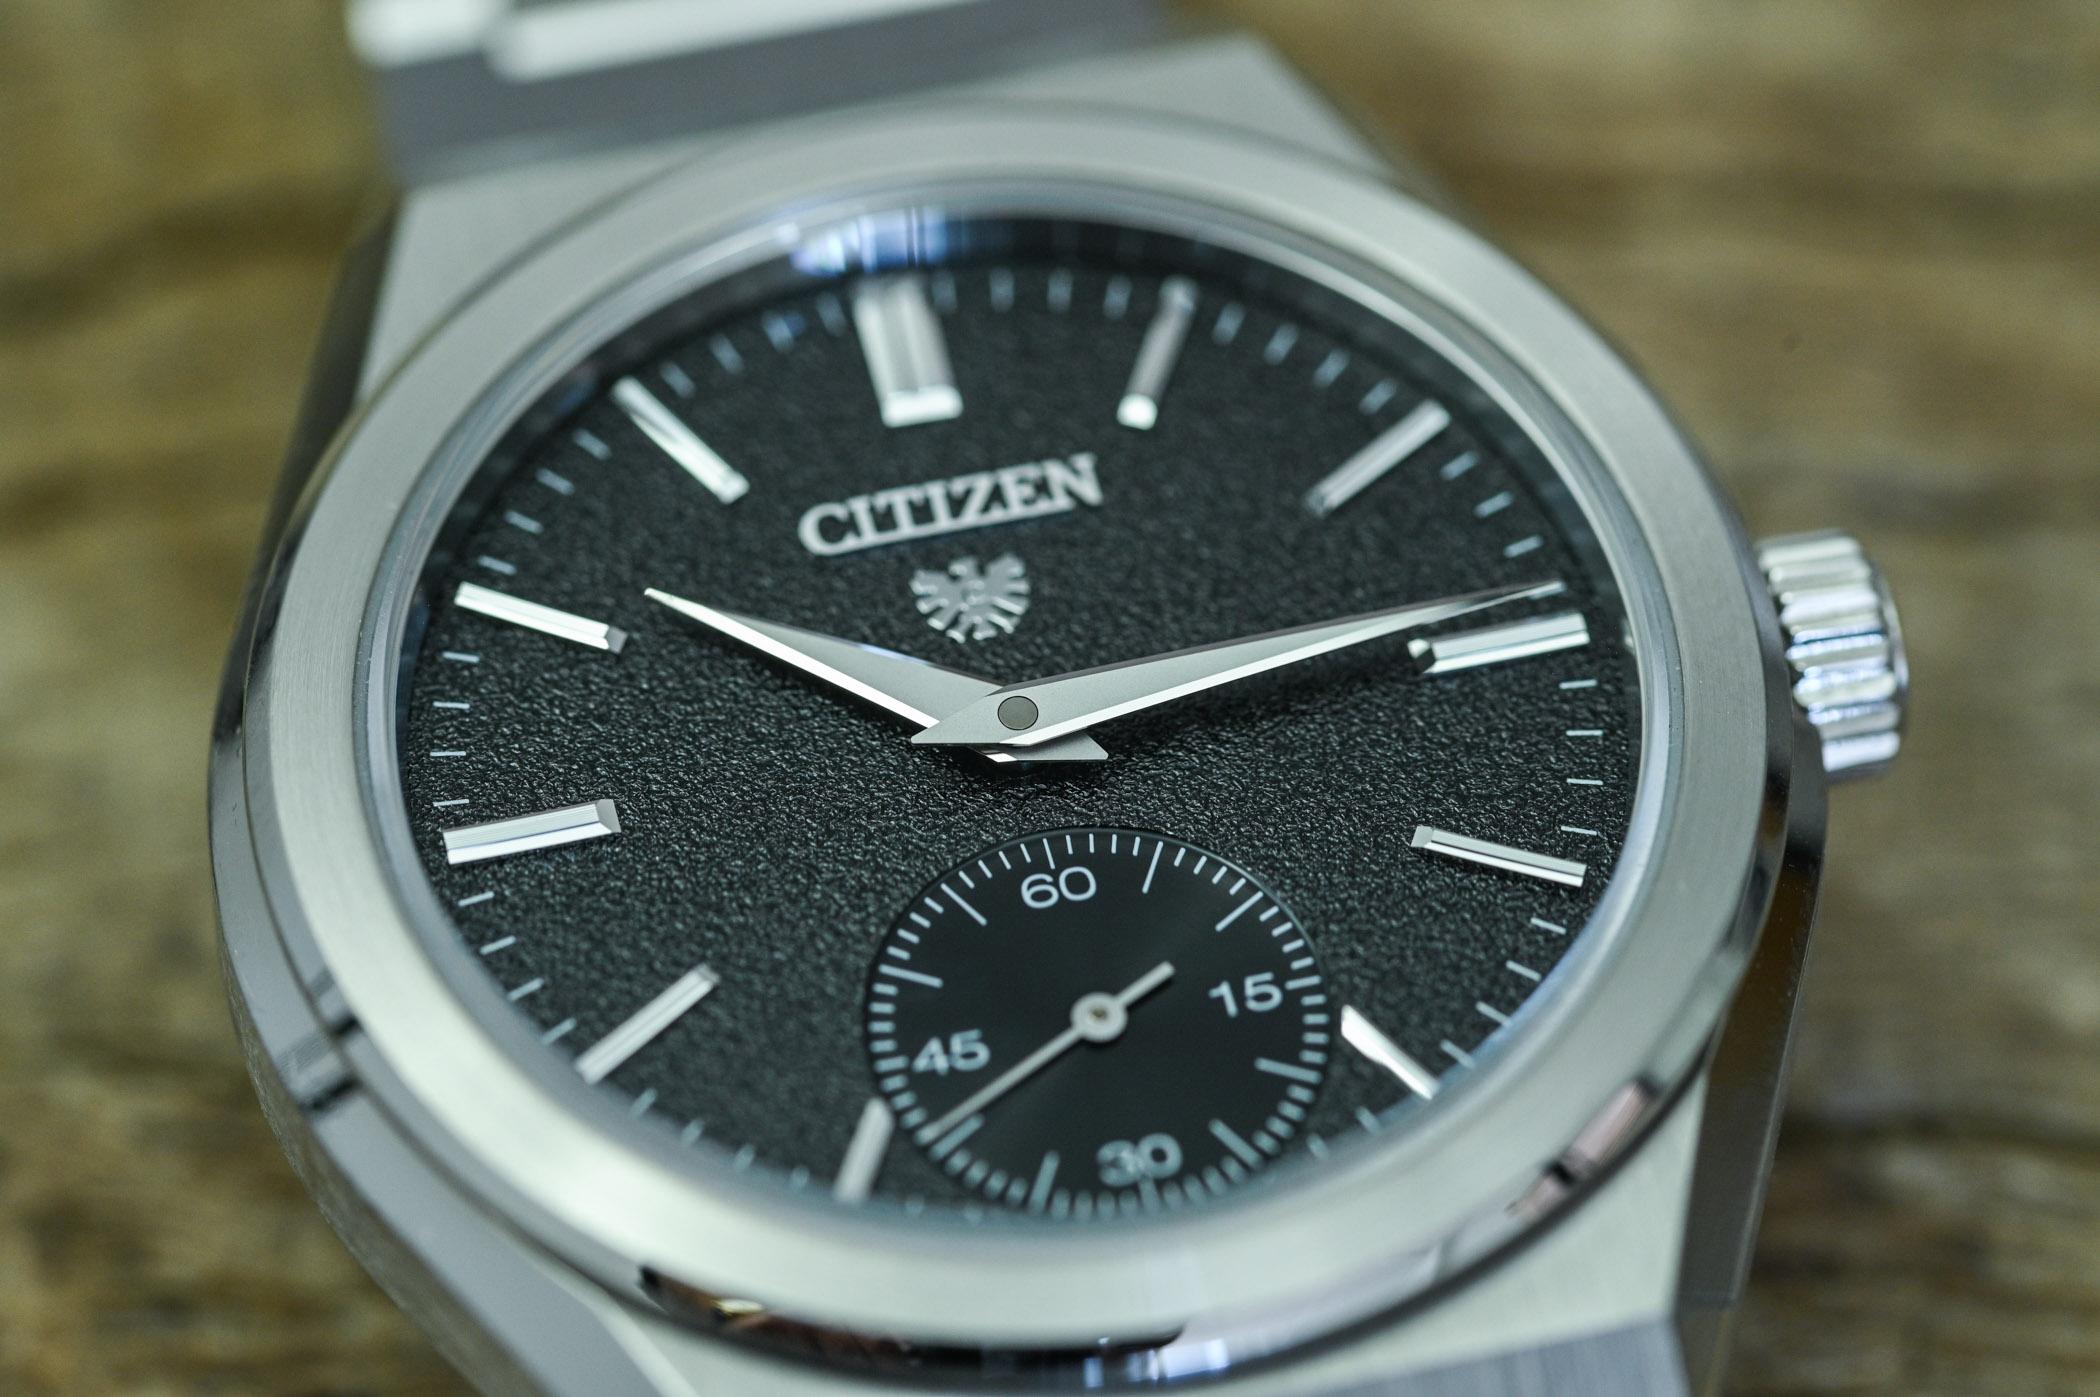 The Citizen Caliber 0200